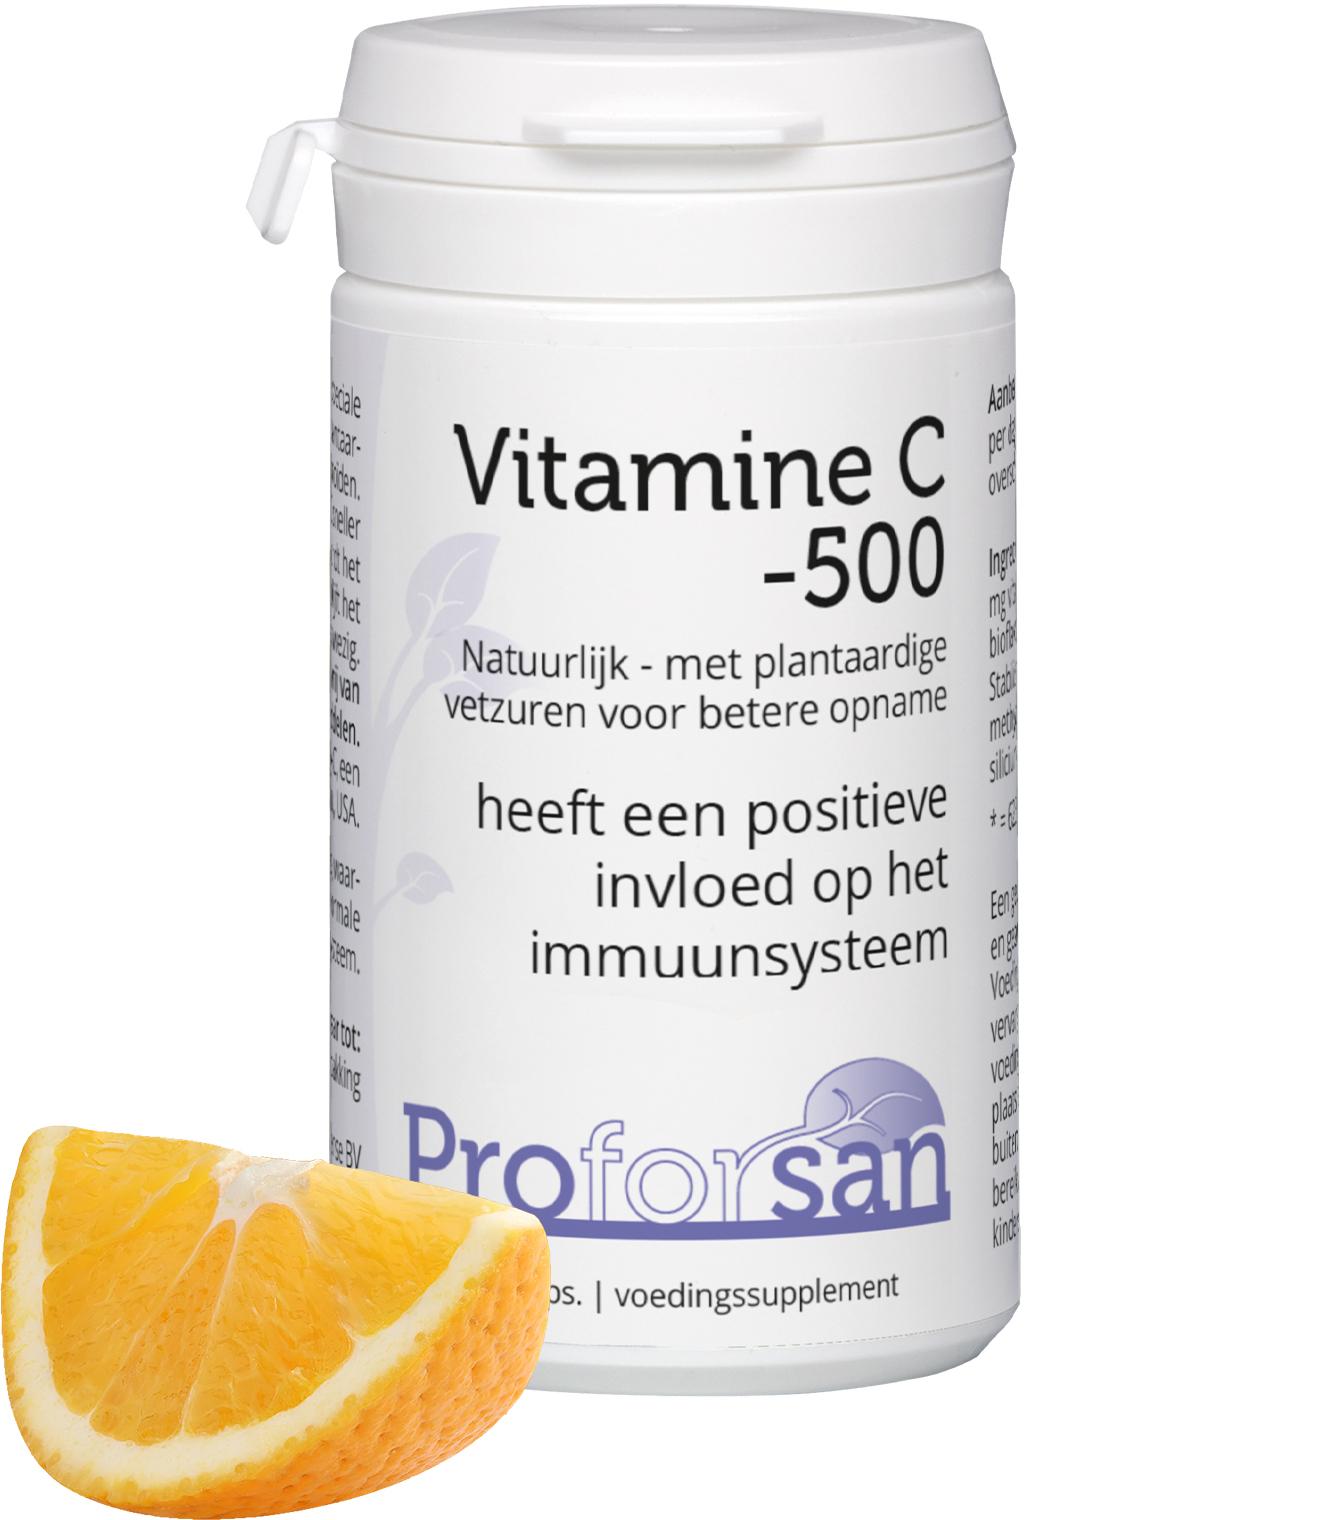 Proforsan Vitamine C-500 - 60 V-capsules